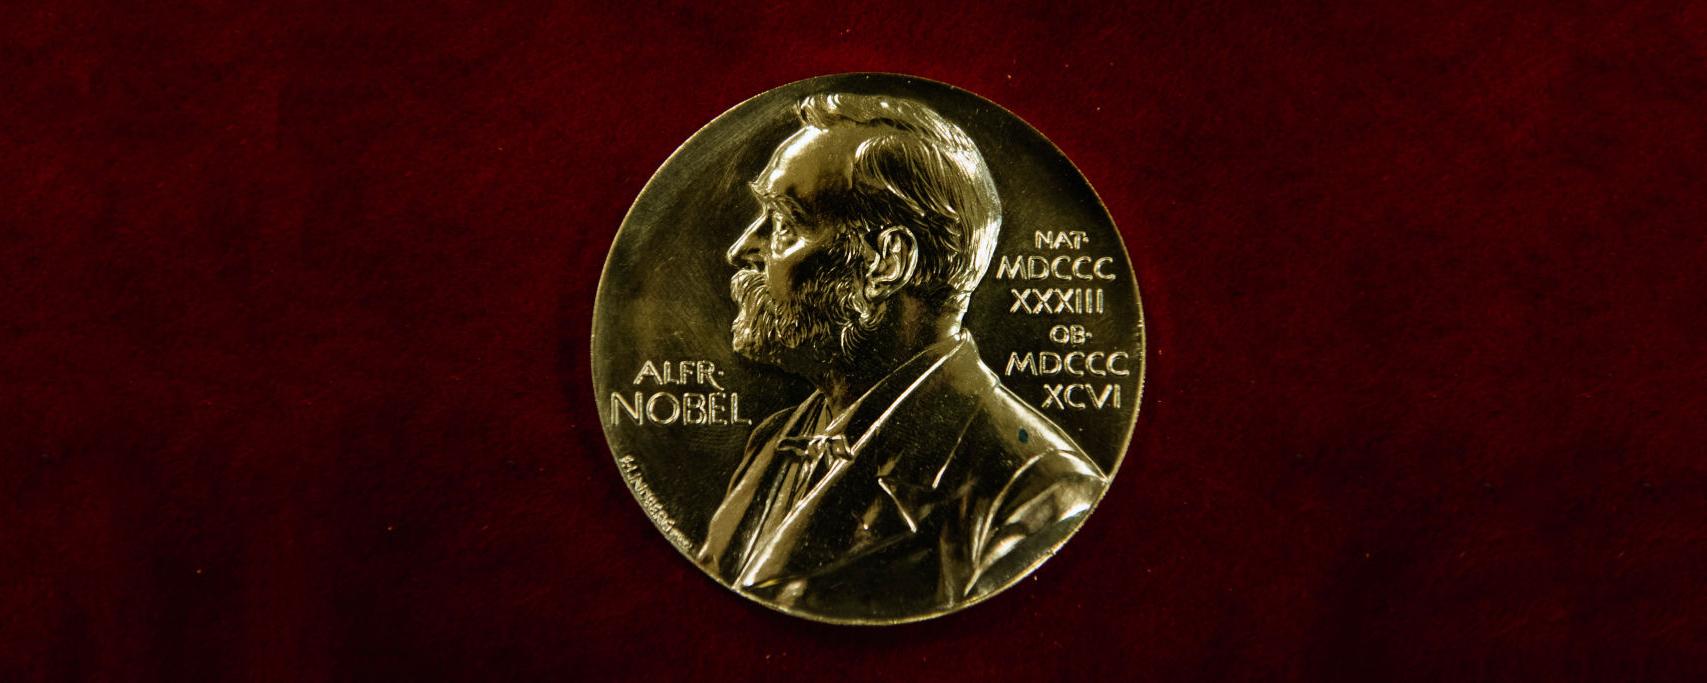 The Sveriges Riksbank Prize in Economic Sciences in Memory of Alfred Nobel